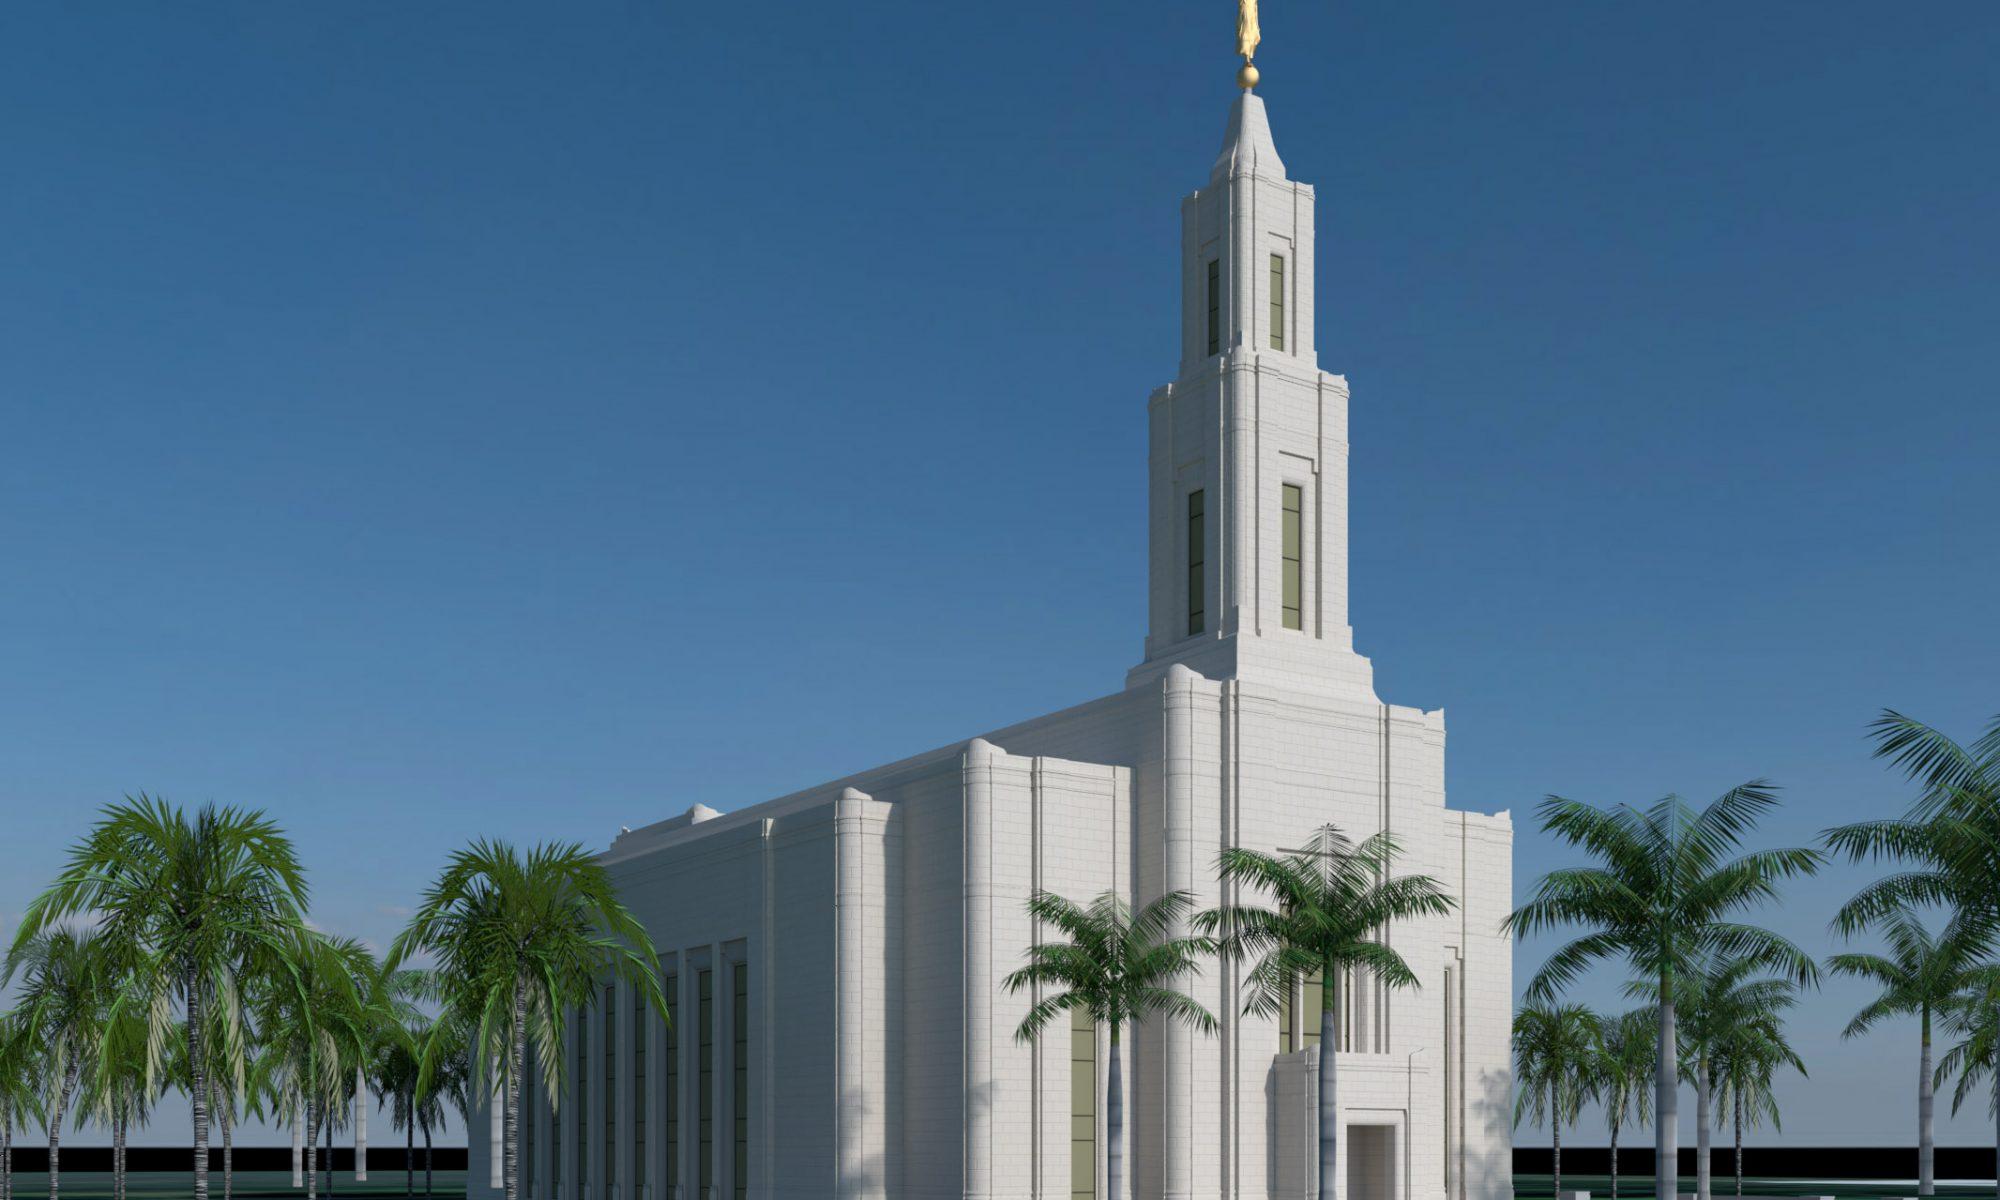 Urdaneta Phillipines Temple image 006